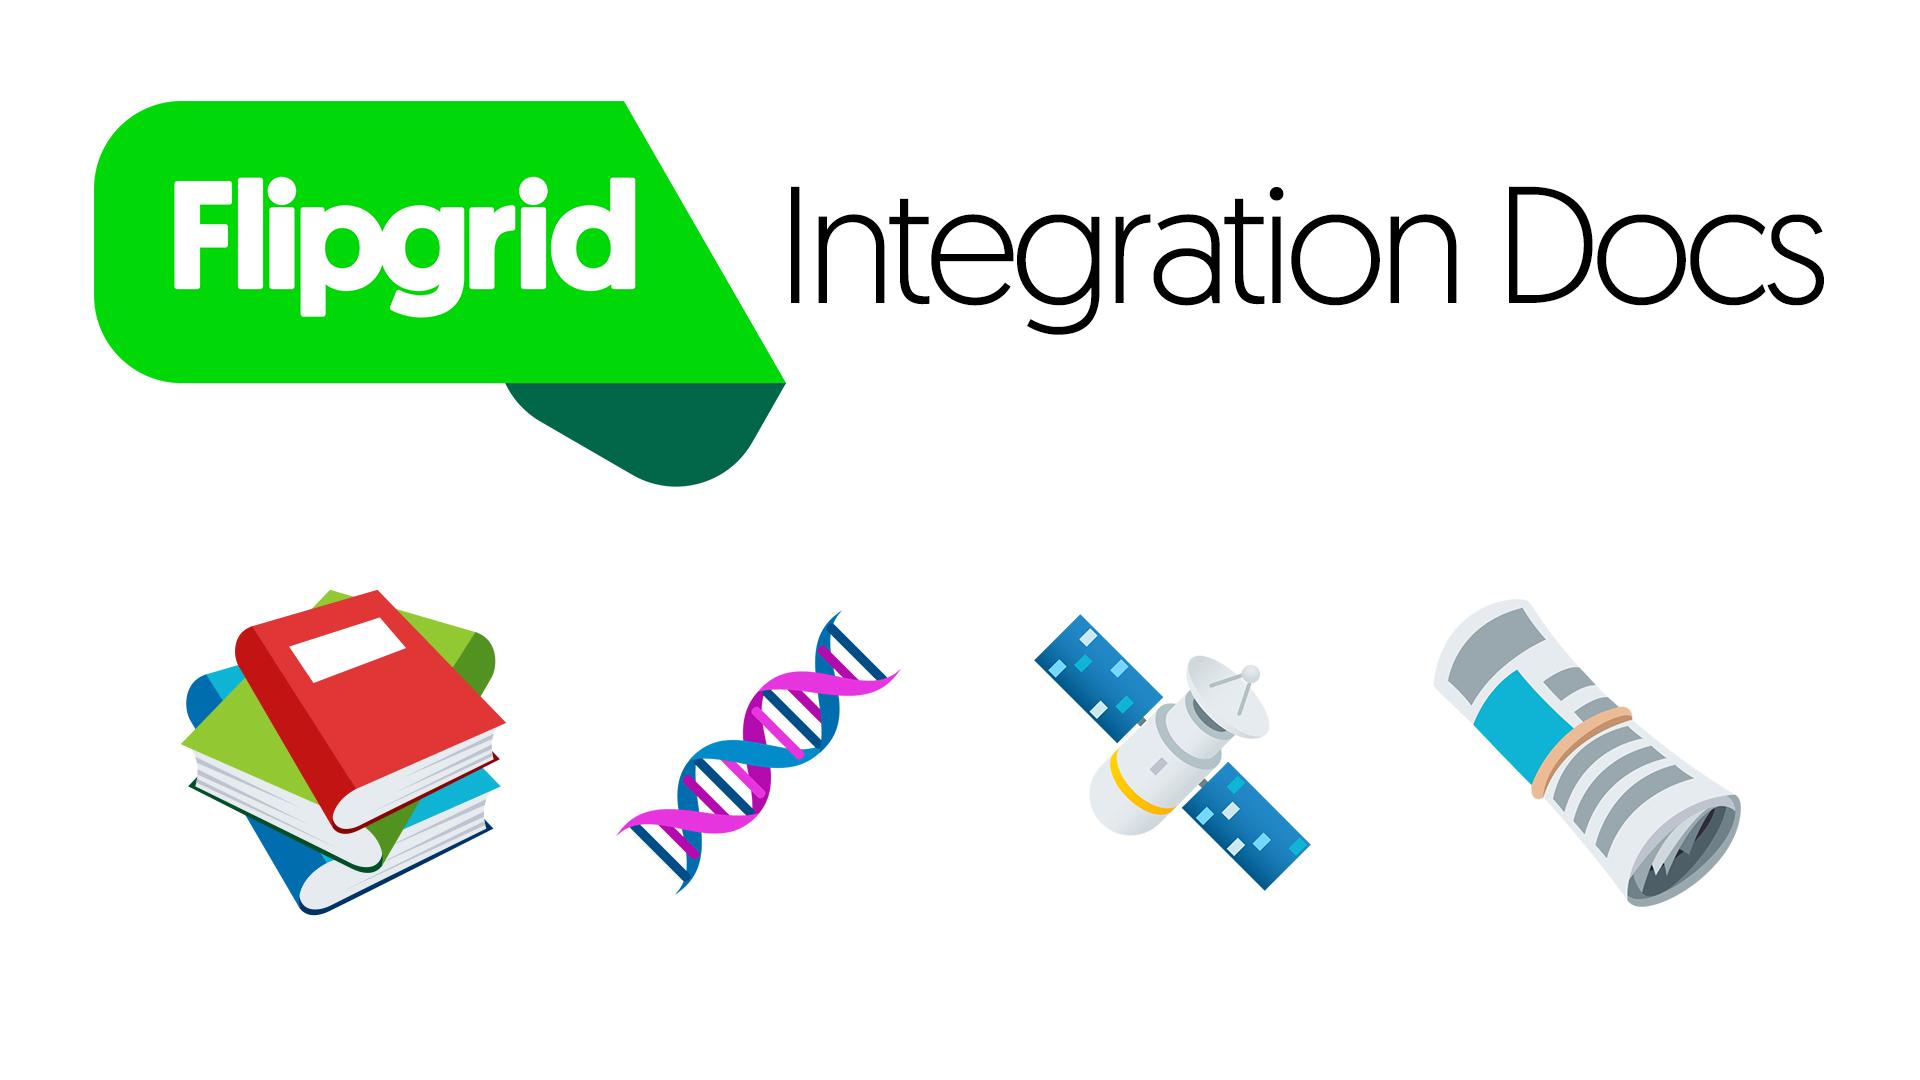 FlipgridIntegrationDocs_2019.jpg